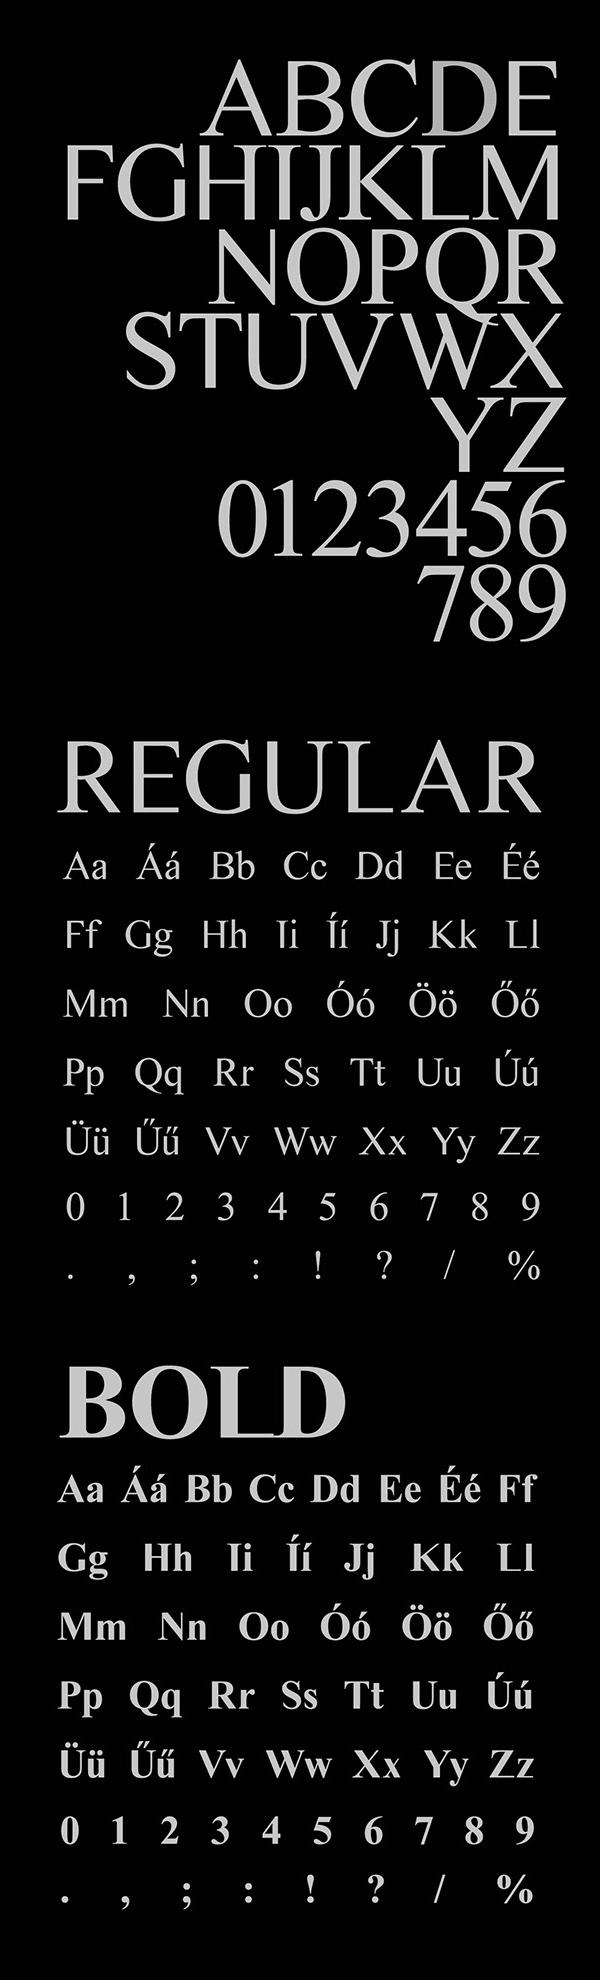 Sometimes Font Letters